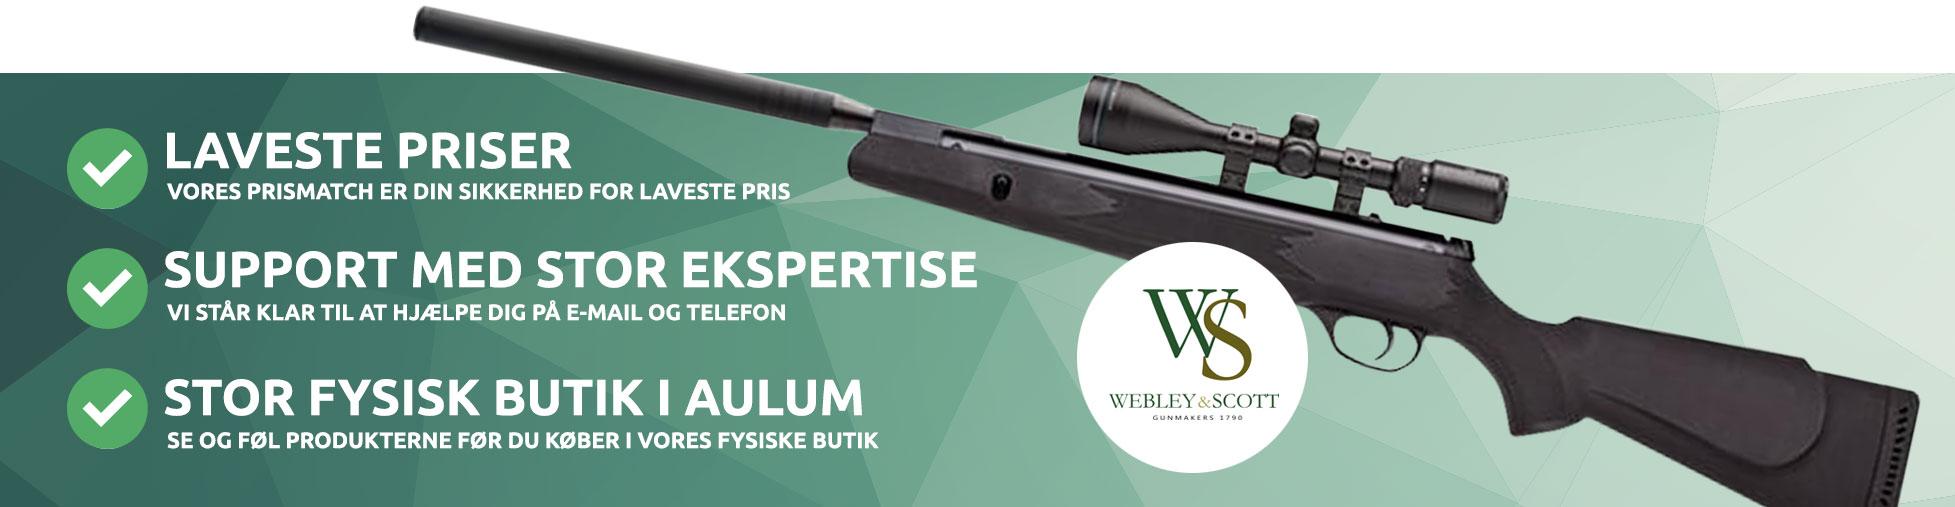 Webley luftgevær